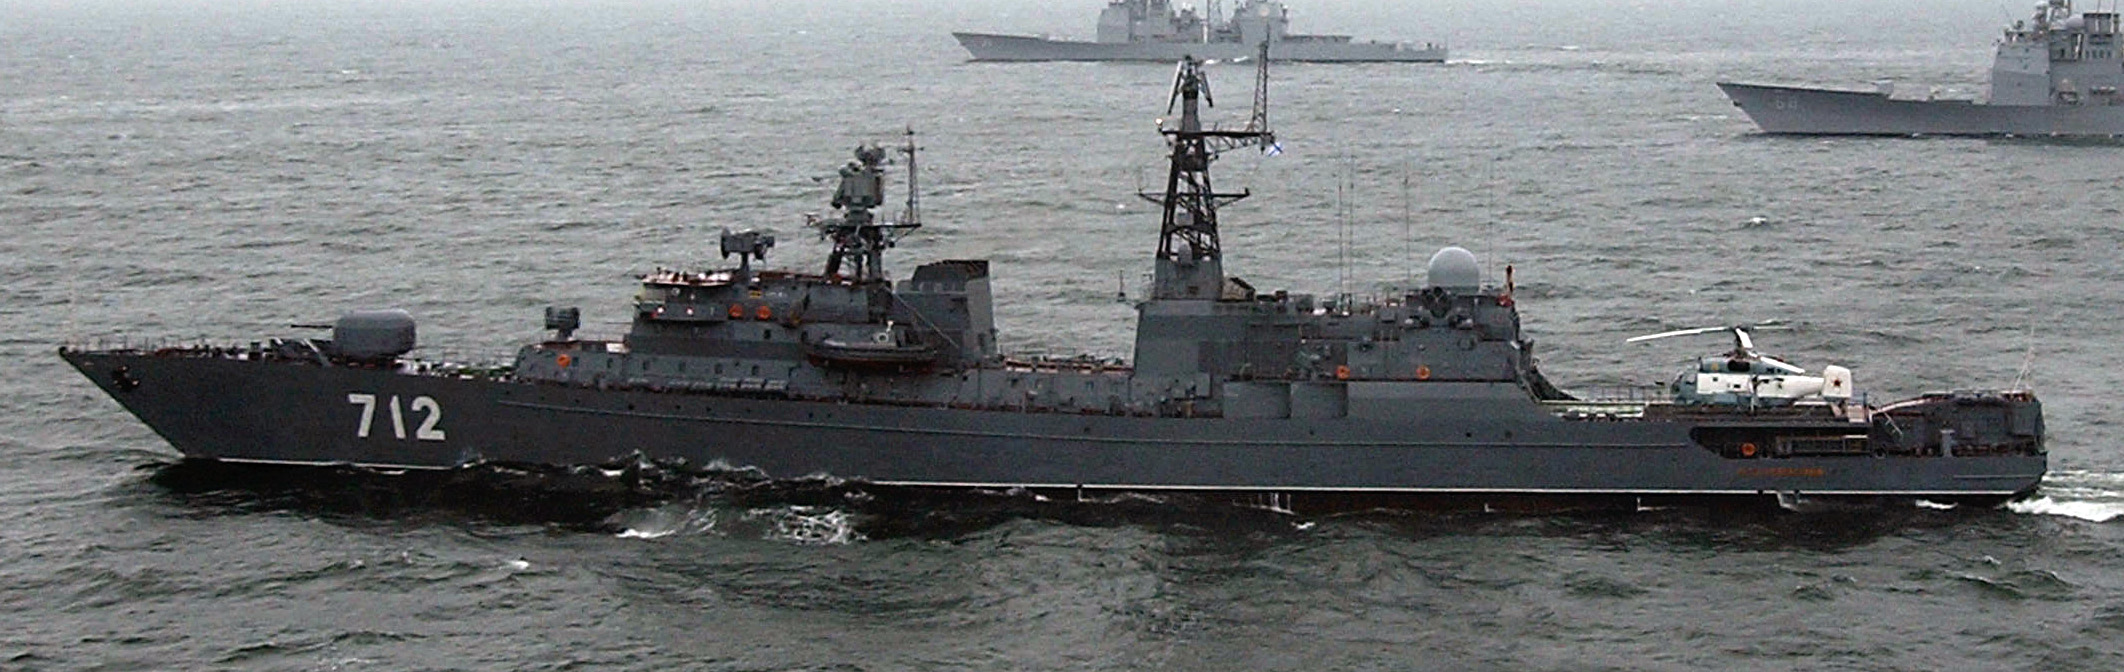 https://upload.wikimedia.org/wikipedia/commons/5/56/NEUSTRASHIMY_class_frigate.jpg